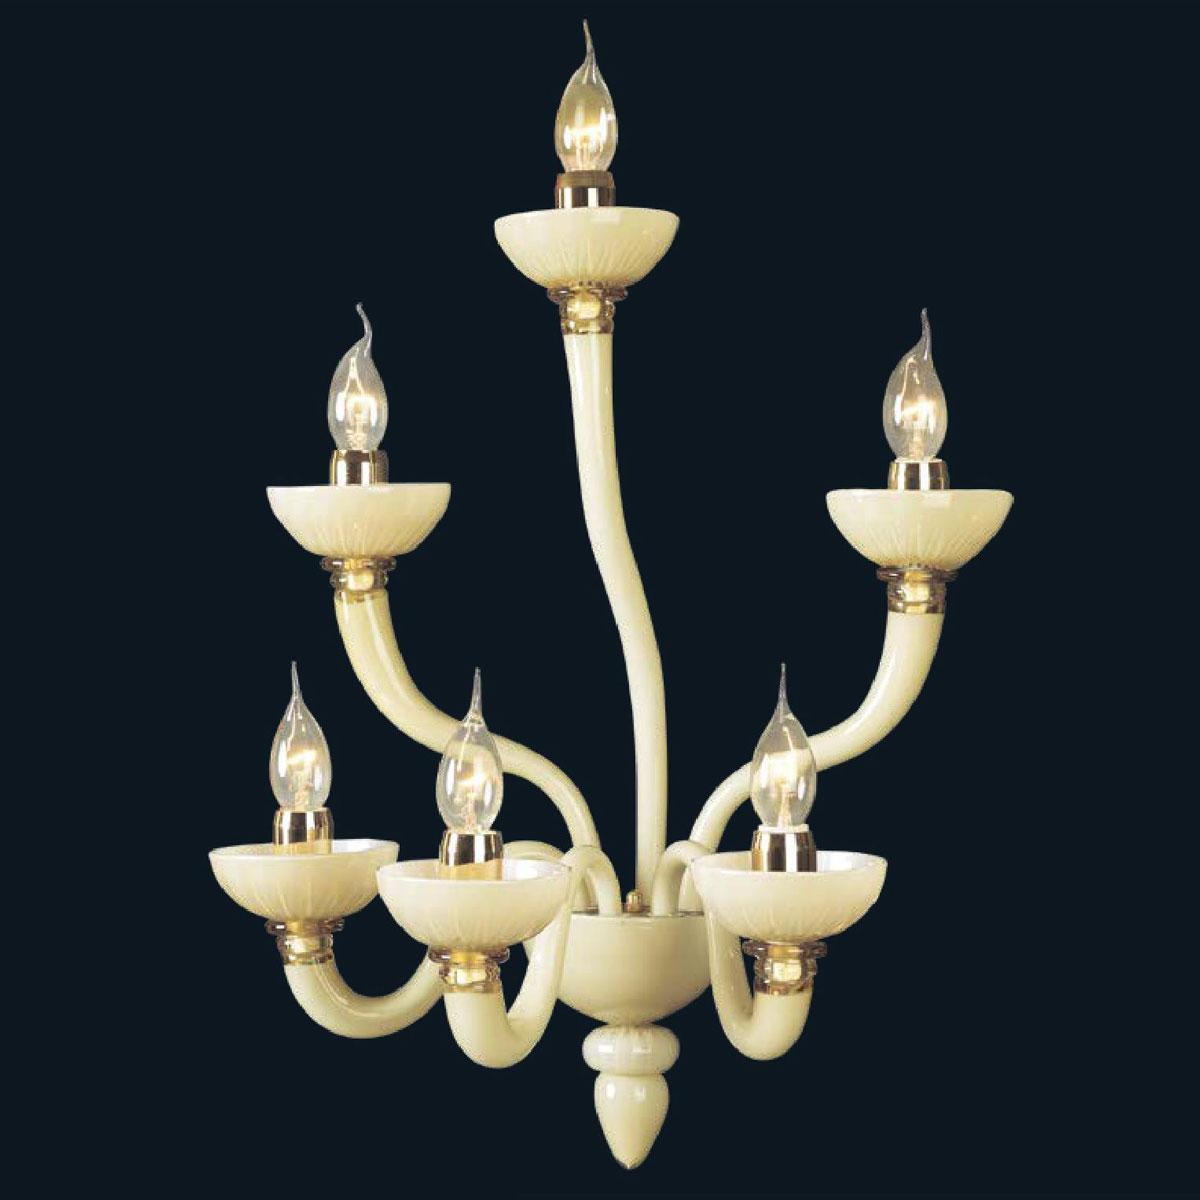 """Fateh"" applique en verre de Murano - 3+2+1 lumières - blanc"